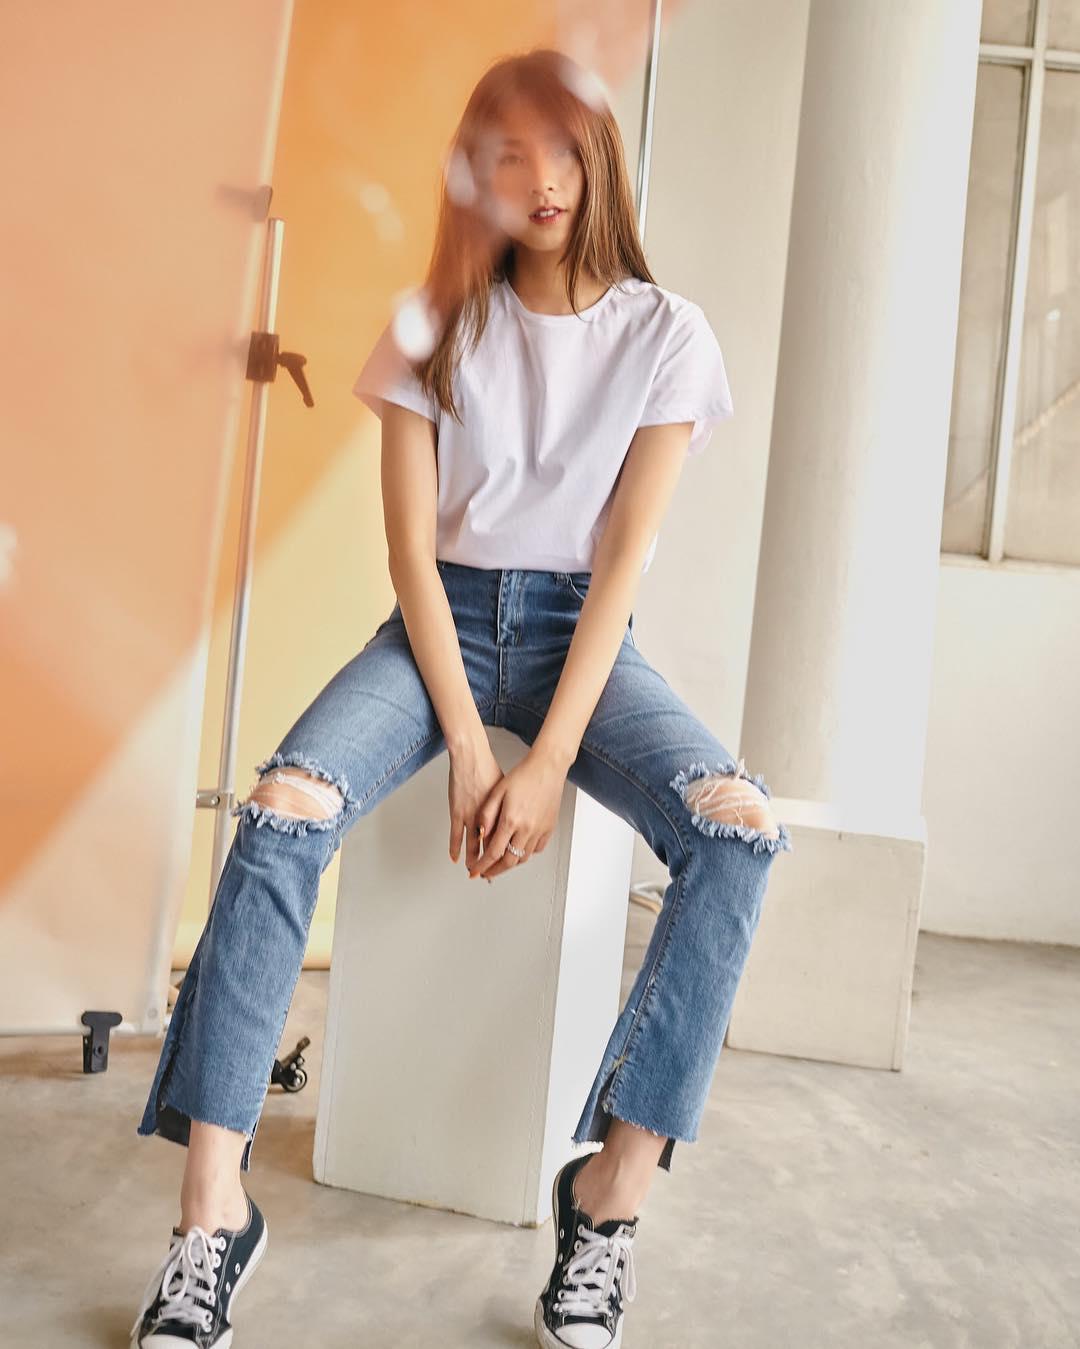 quần jean áo thun đẹp